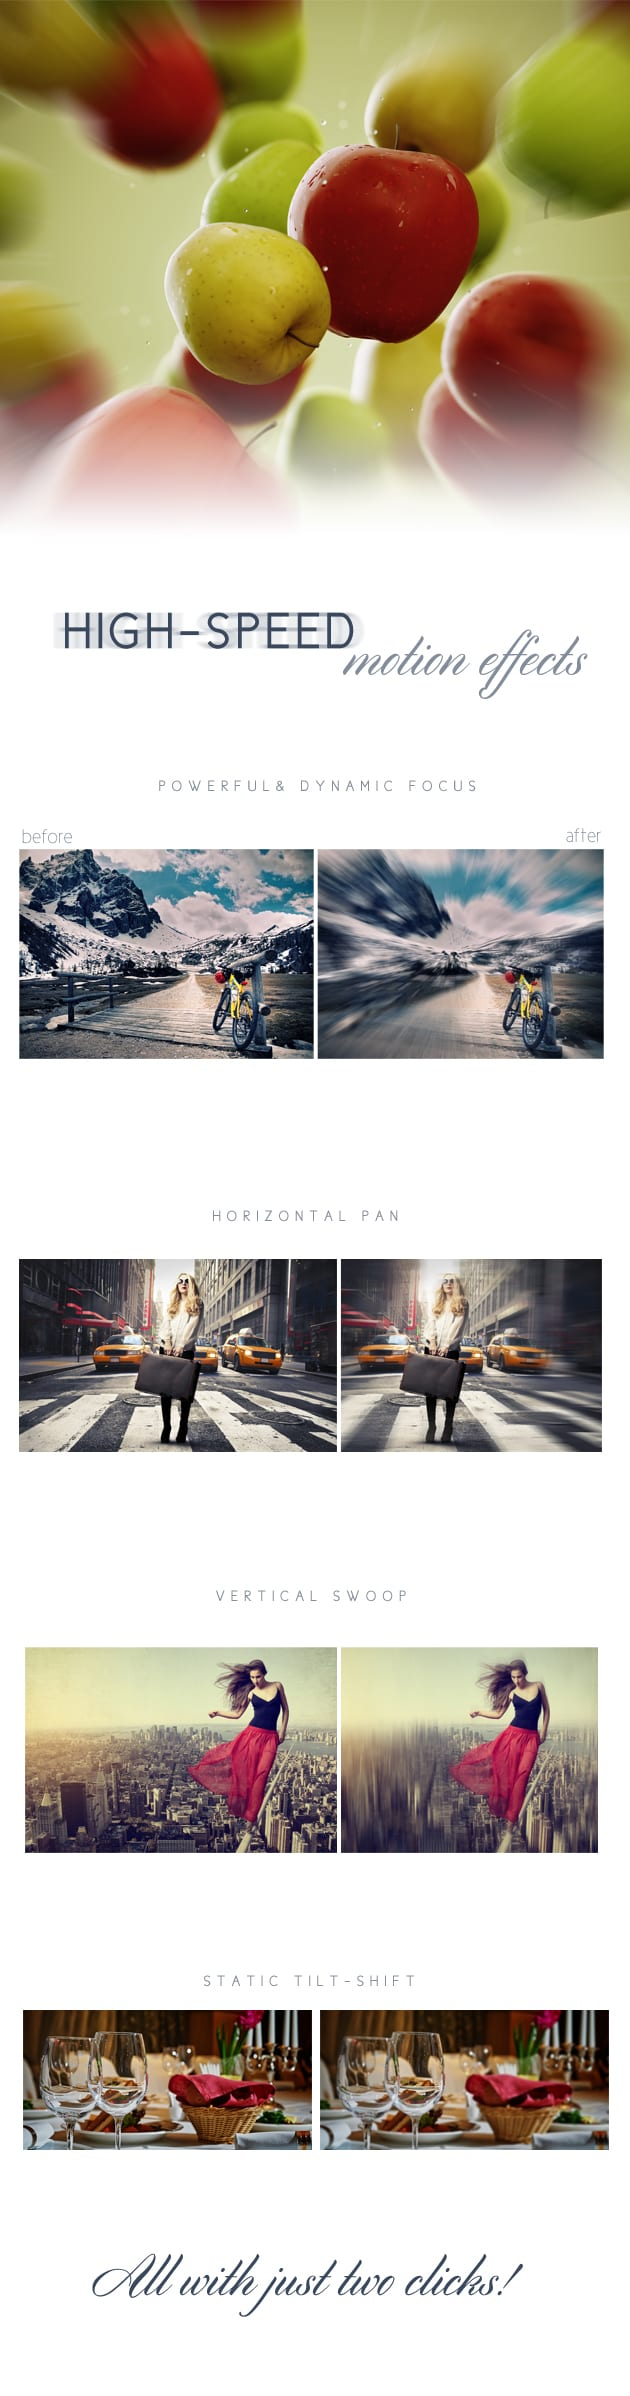 16-designtnt-addons-fast-motion-effects-large